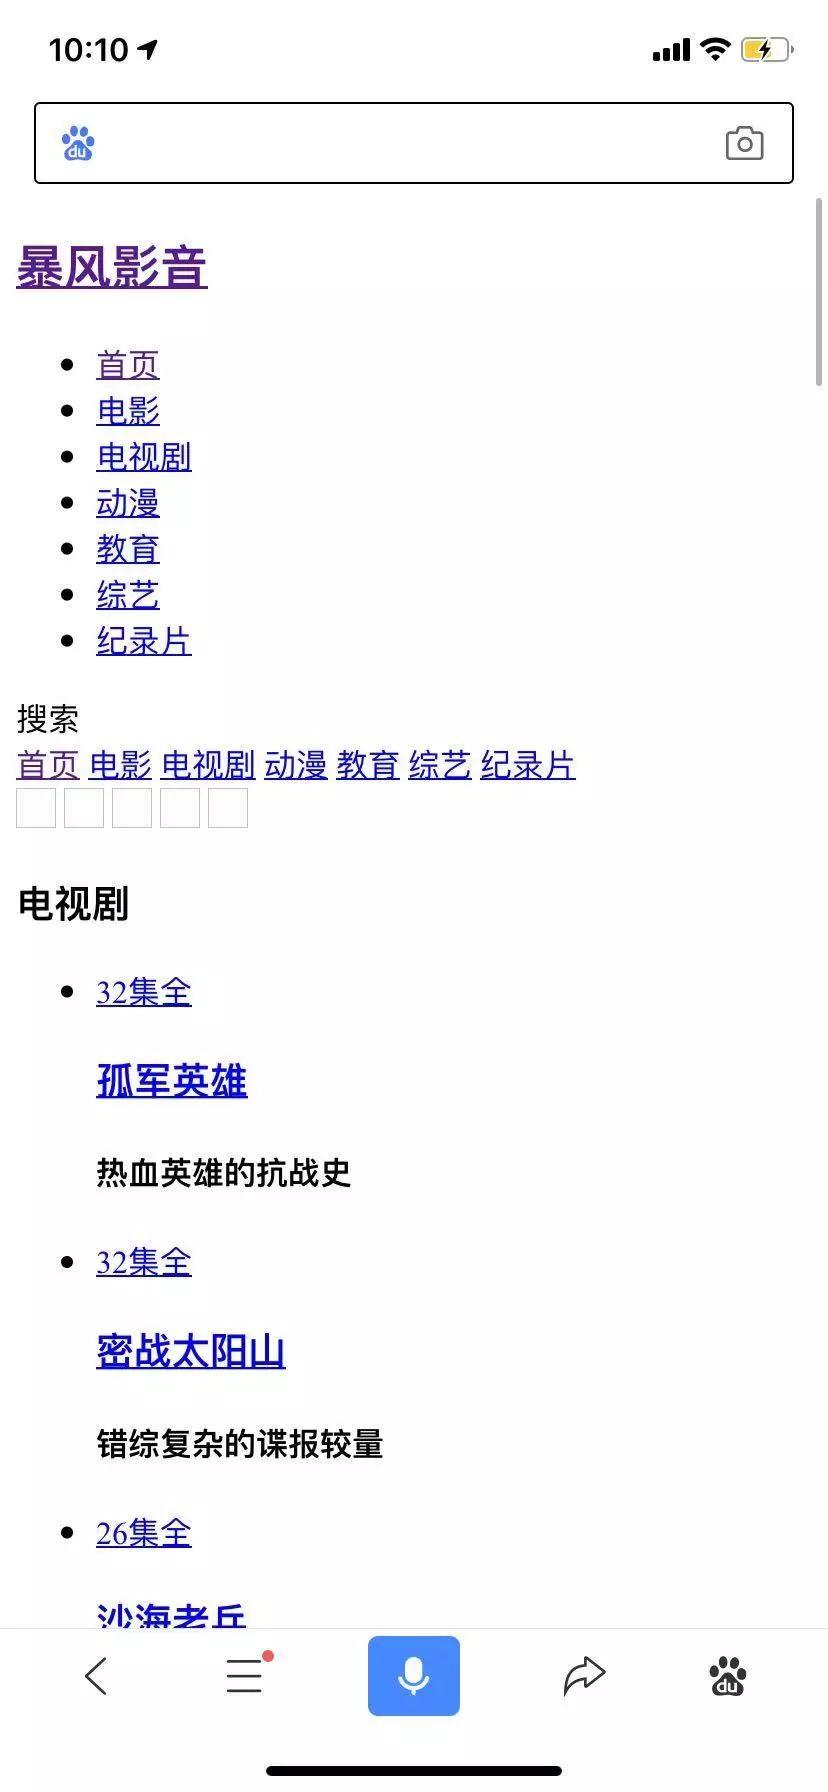 「kb0707官方网站」CSGO:V社确定下一届Major改制 0-3出局的战队将不会拿到直邀资格